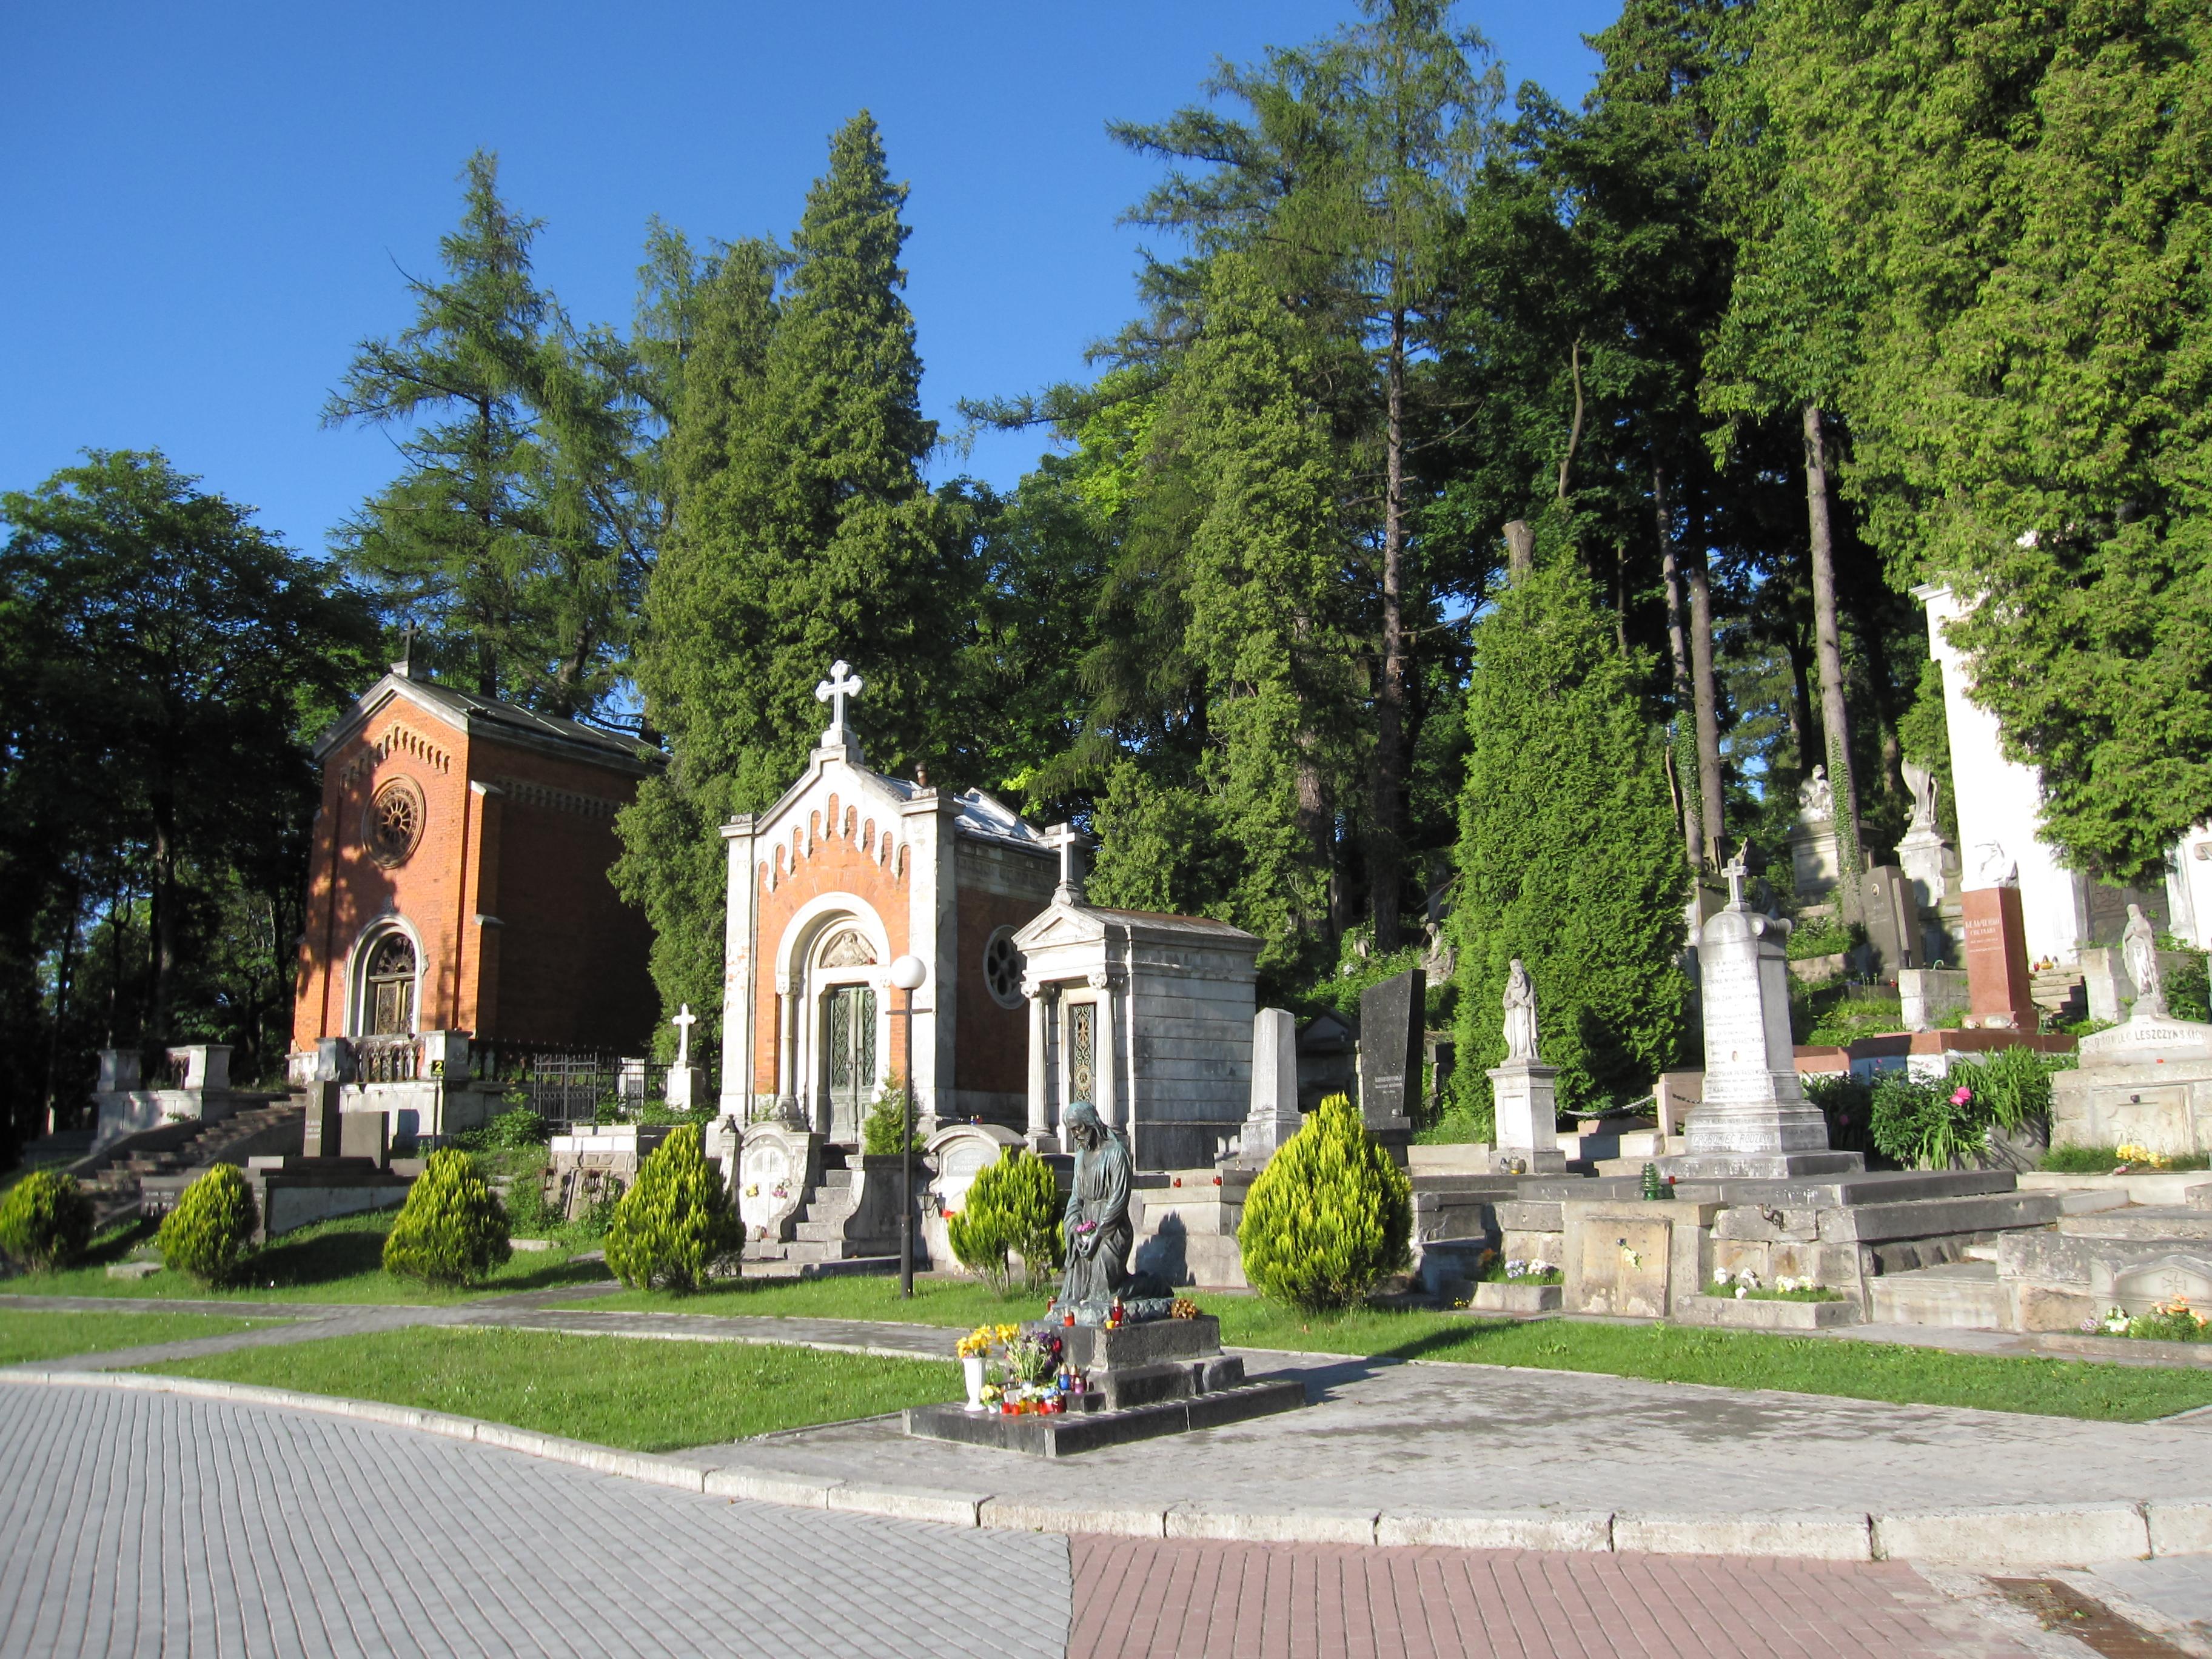 https://upload.wikimedia.org/wikipedia/commons/7/76/Luetzenhofer_Friedhof_006.JPG